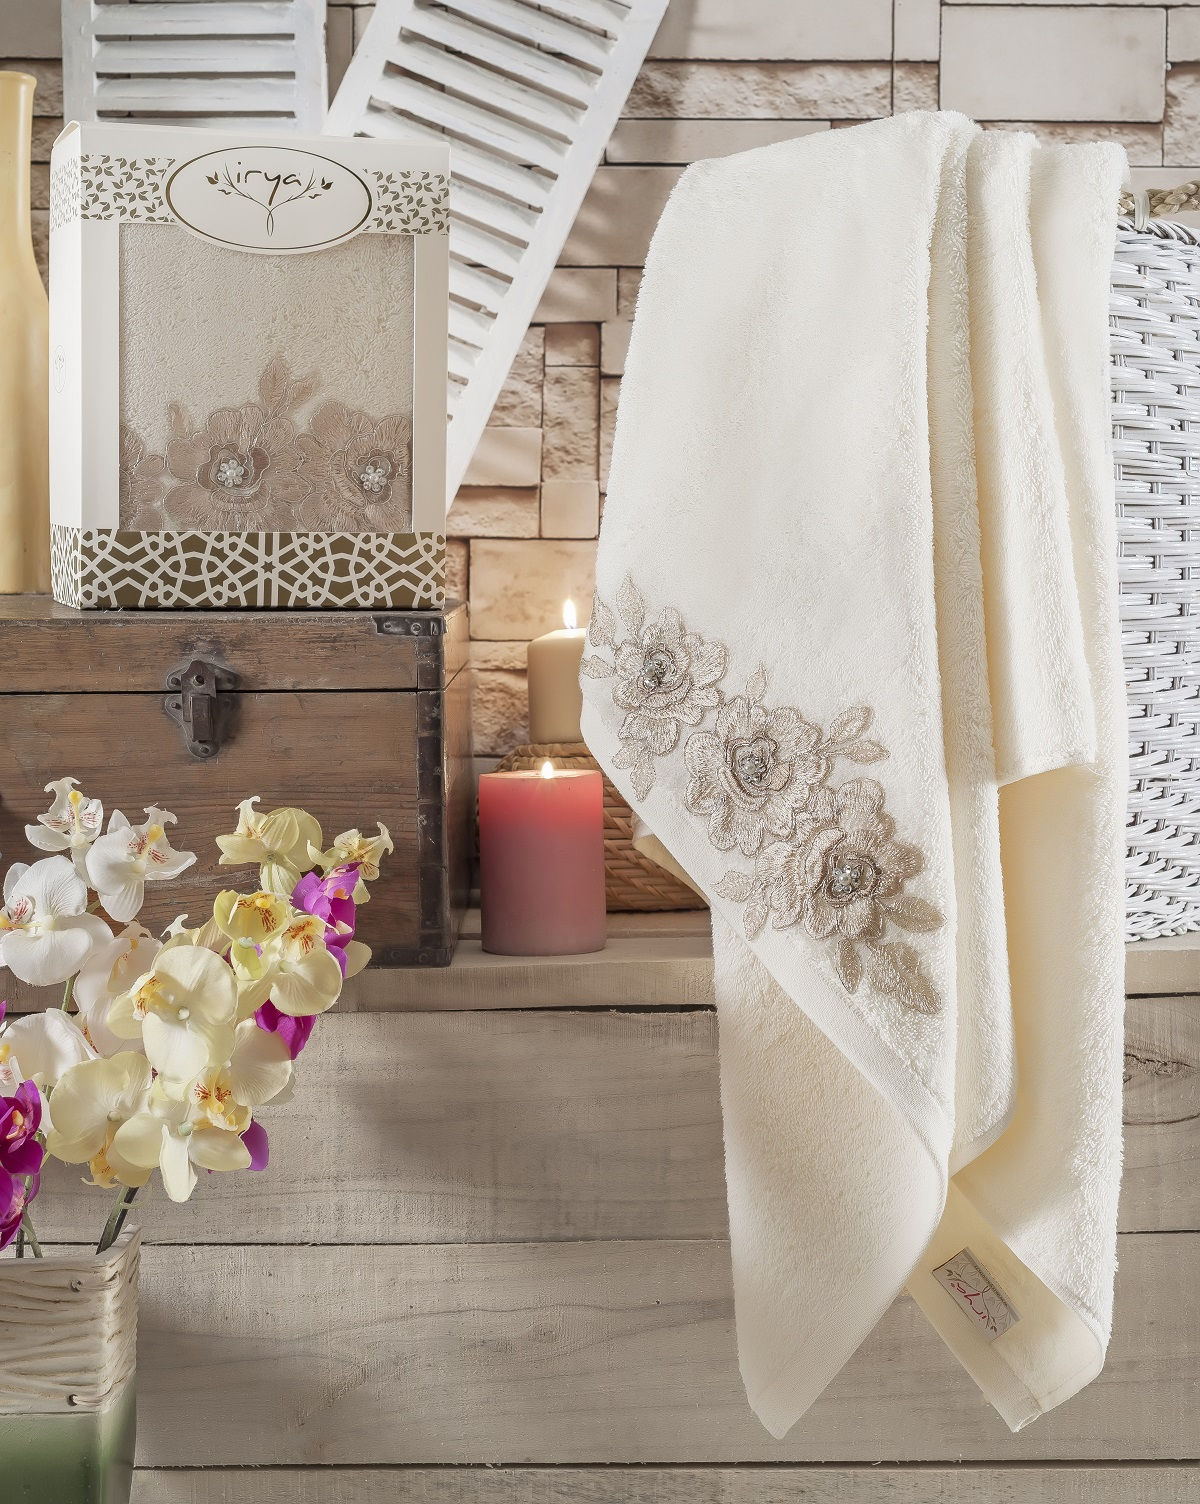 Купить Полотенца IRYA, Полотенце Romantic Цвет: Молочный (85х150 см), Турция, Бежевый, Махра